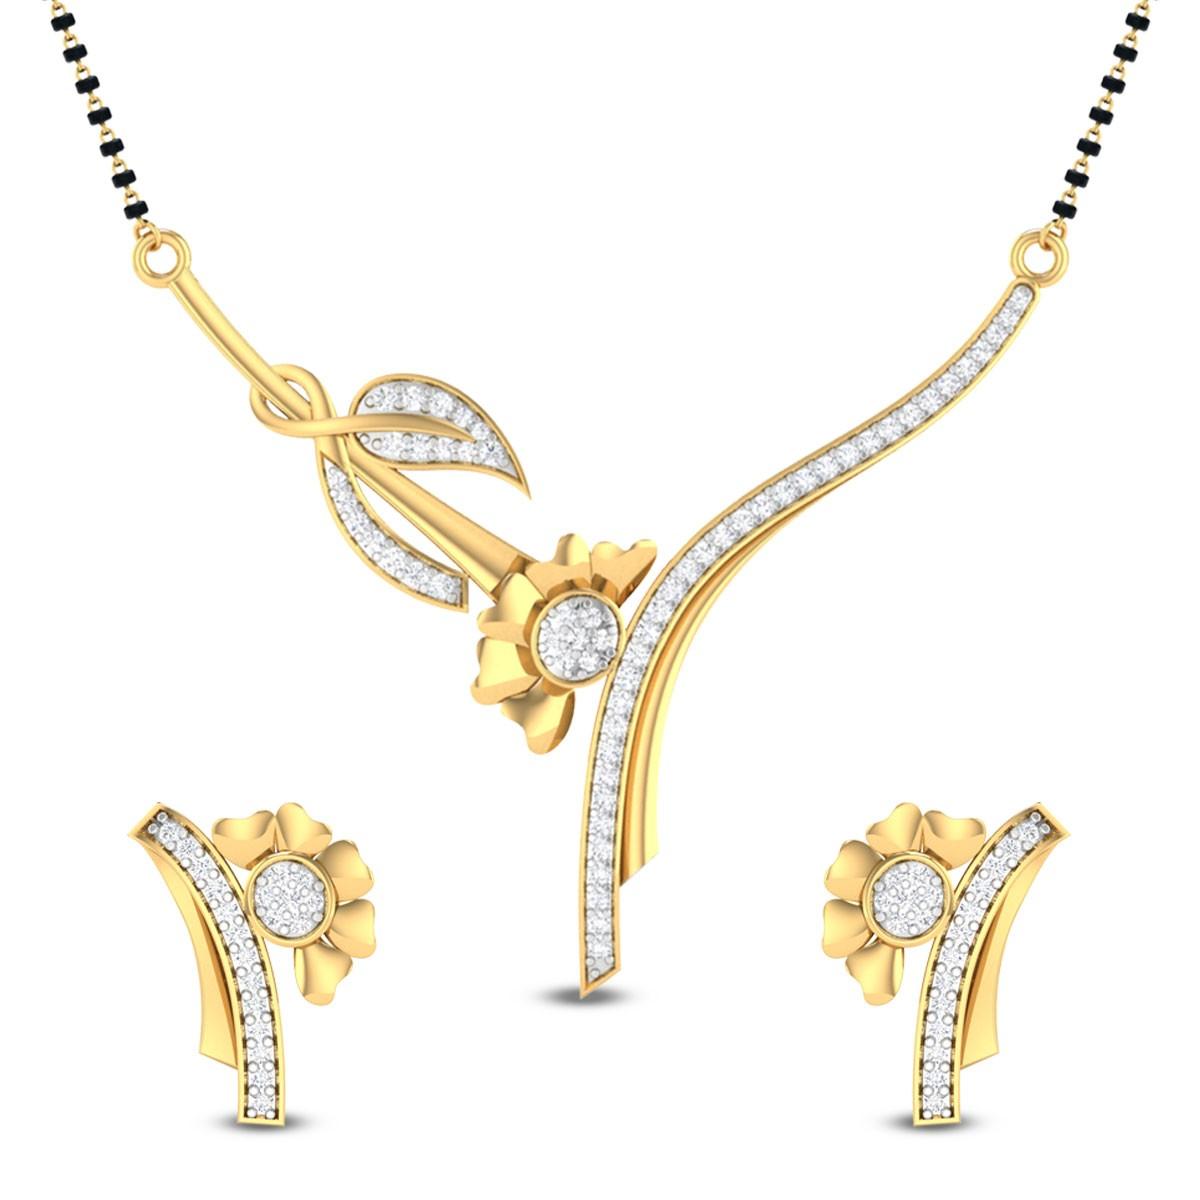 Brinley Leafy Floral Diamond Mangalsutra Set